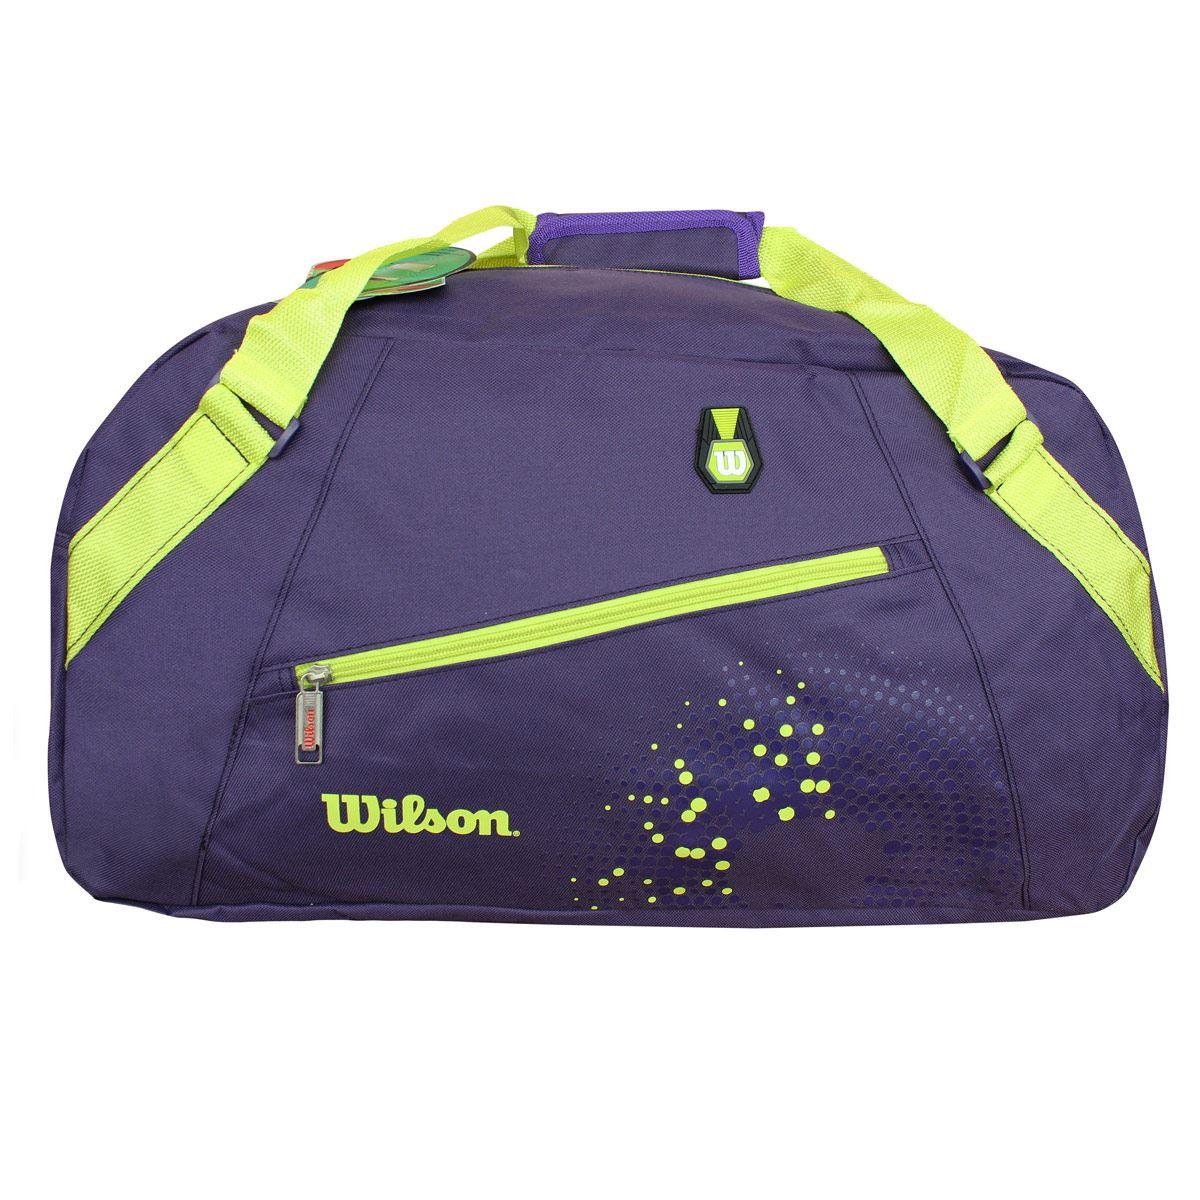 Maleta Deportiva Wilson Is-15321 Violeta Verde